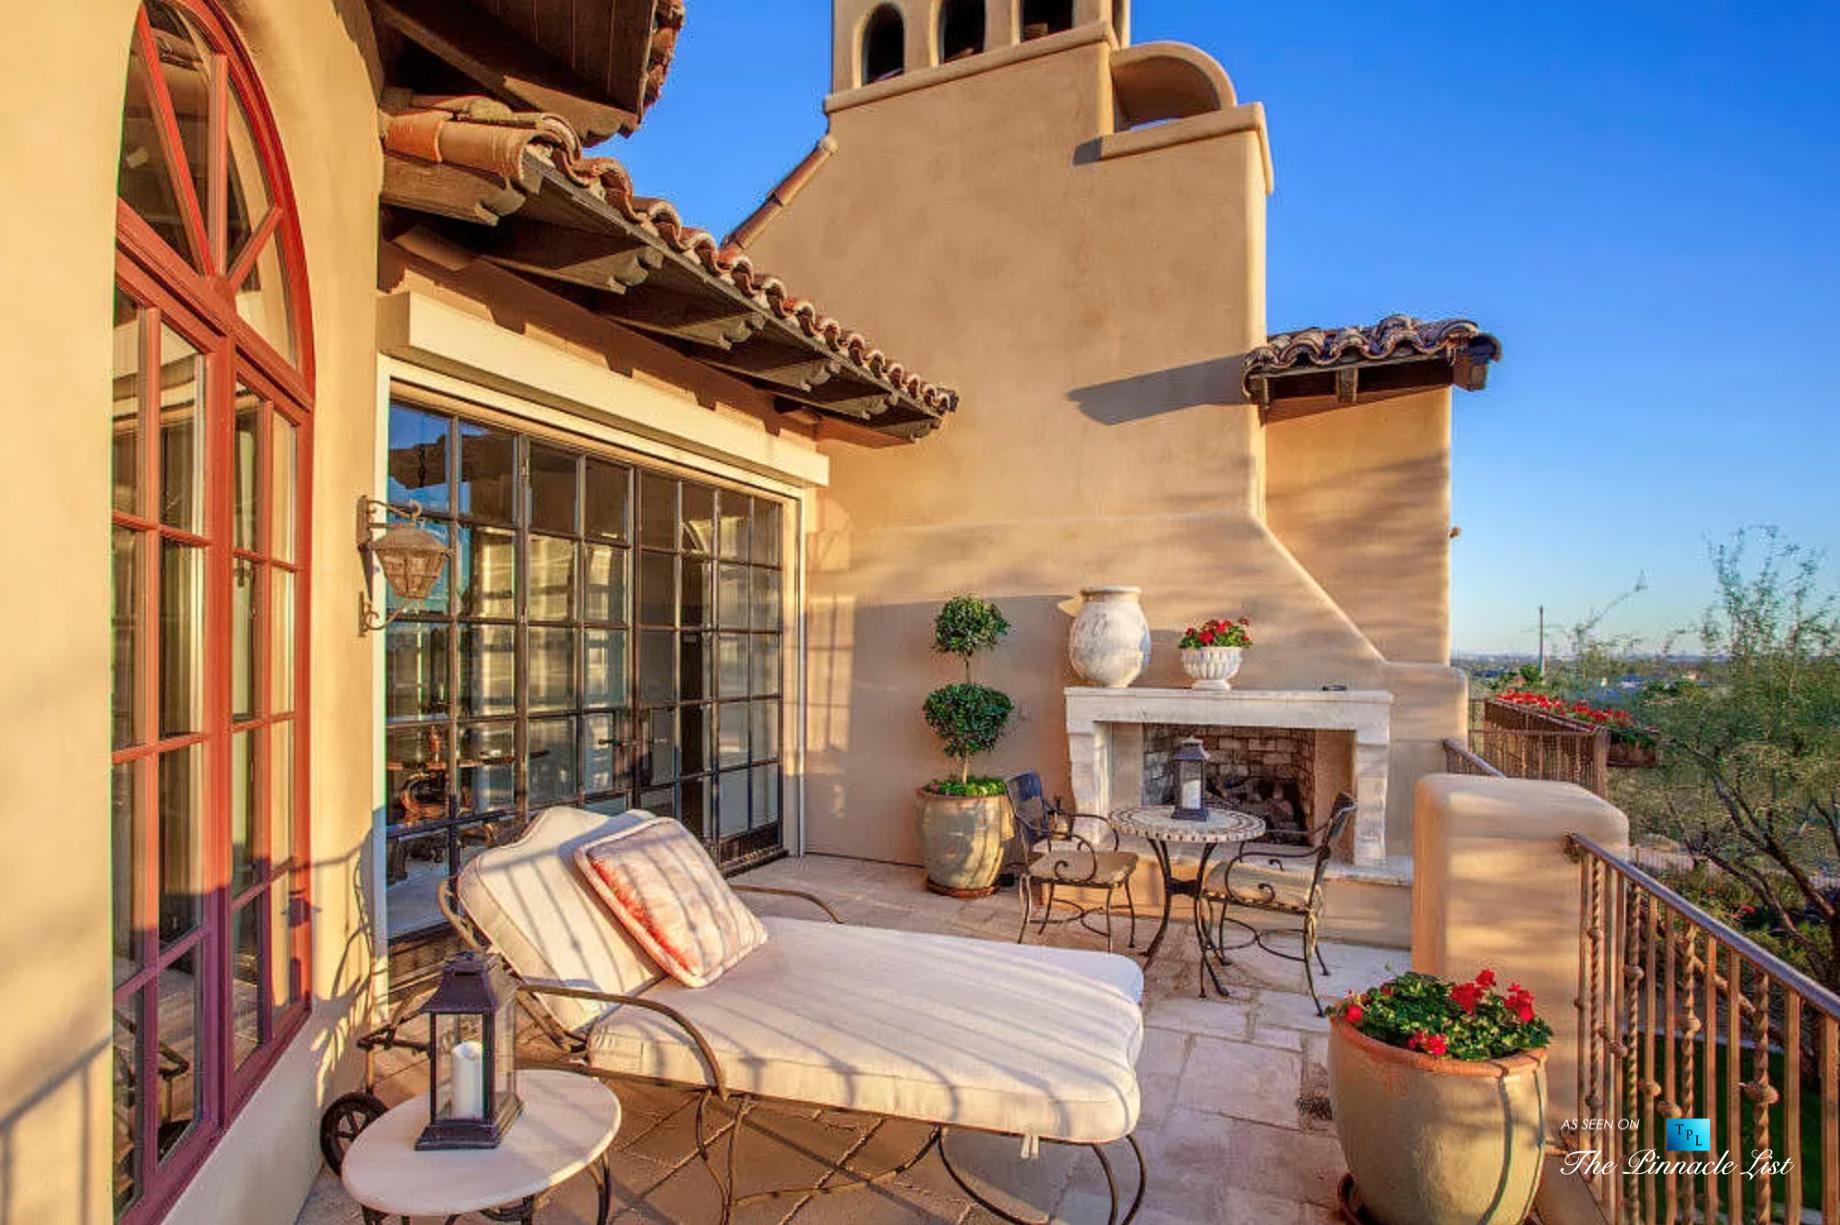 Spanish Colonial Biltmore Mountain Estate - 6539 N 31st Pl, Phoenix, AZ, USA - Master Bedroom Balcony